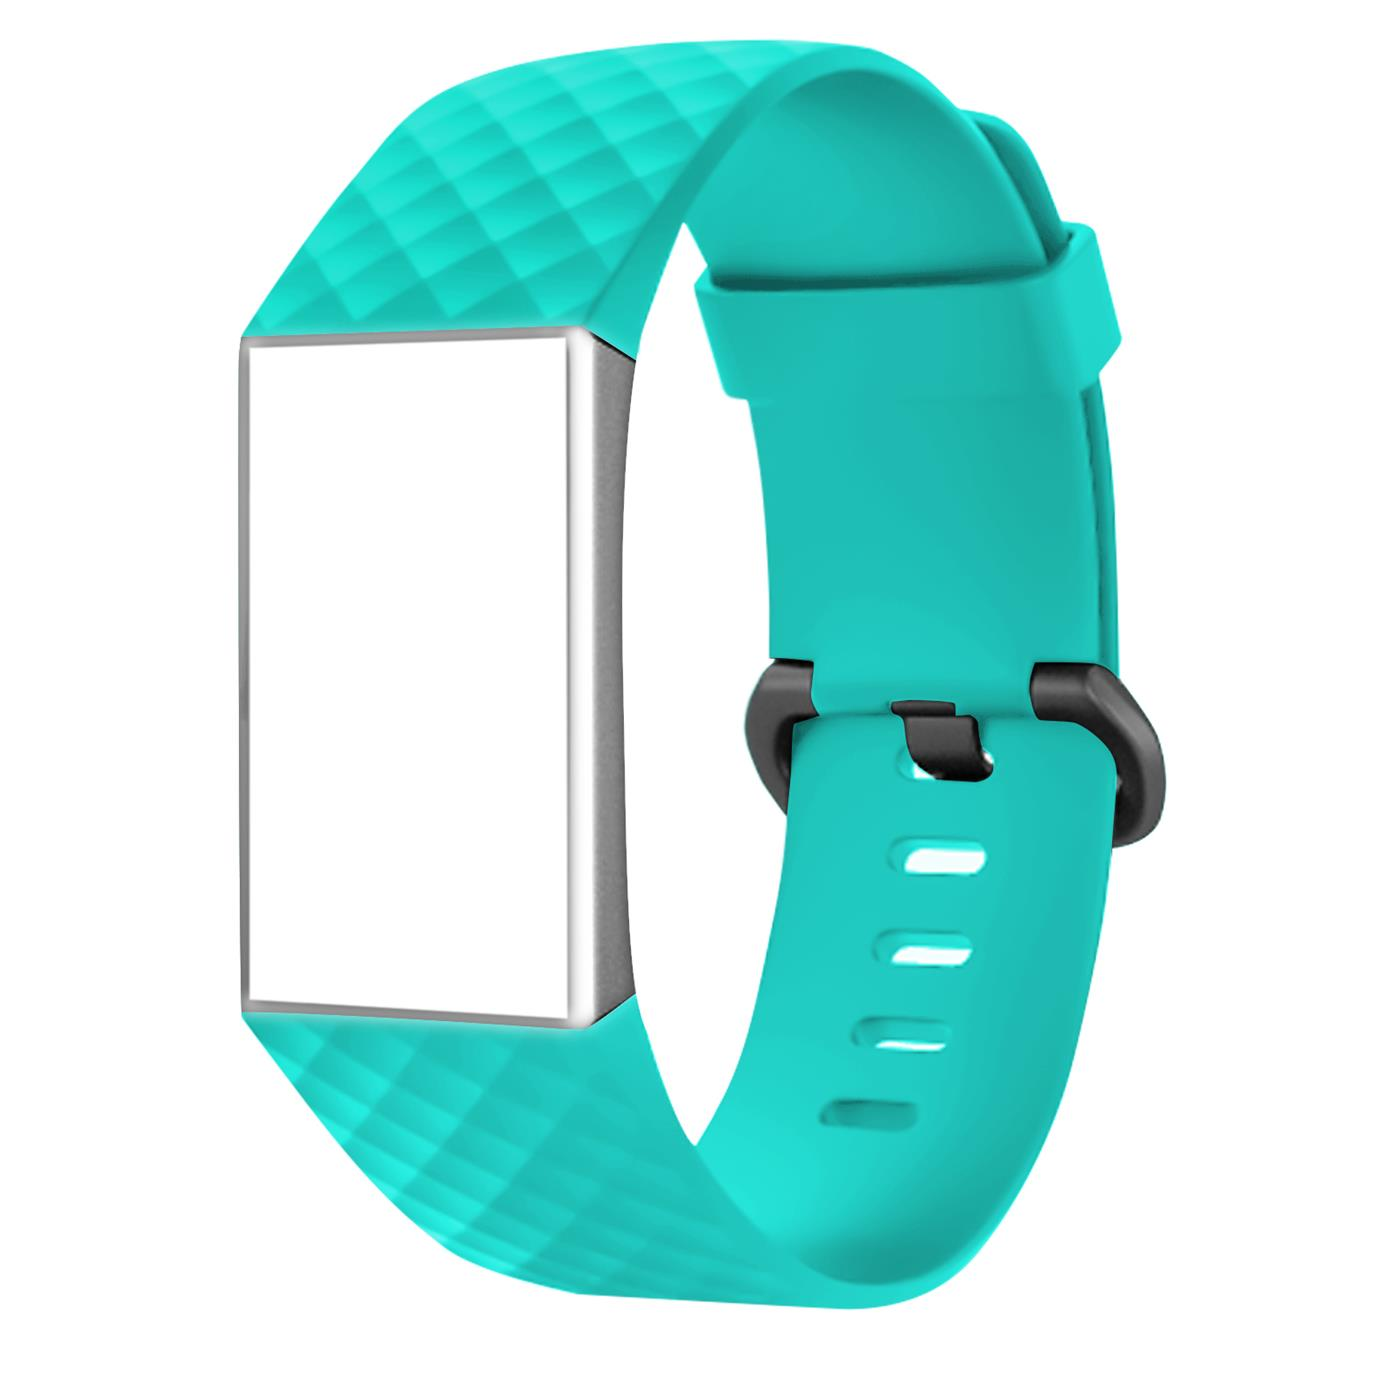 Fitbit-Groesse-S-oder-L-Ersatz-Silikon-Armband-Uhren-Sport-Band-Fitness-Tracker Indexbild 21